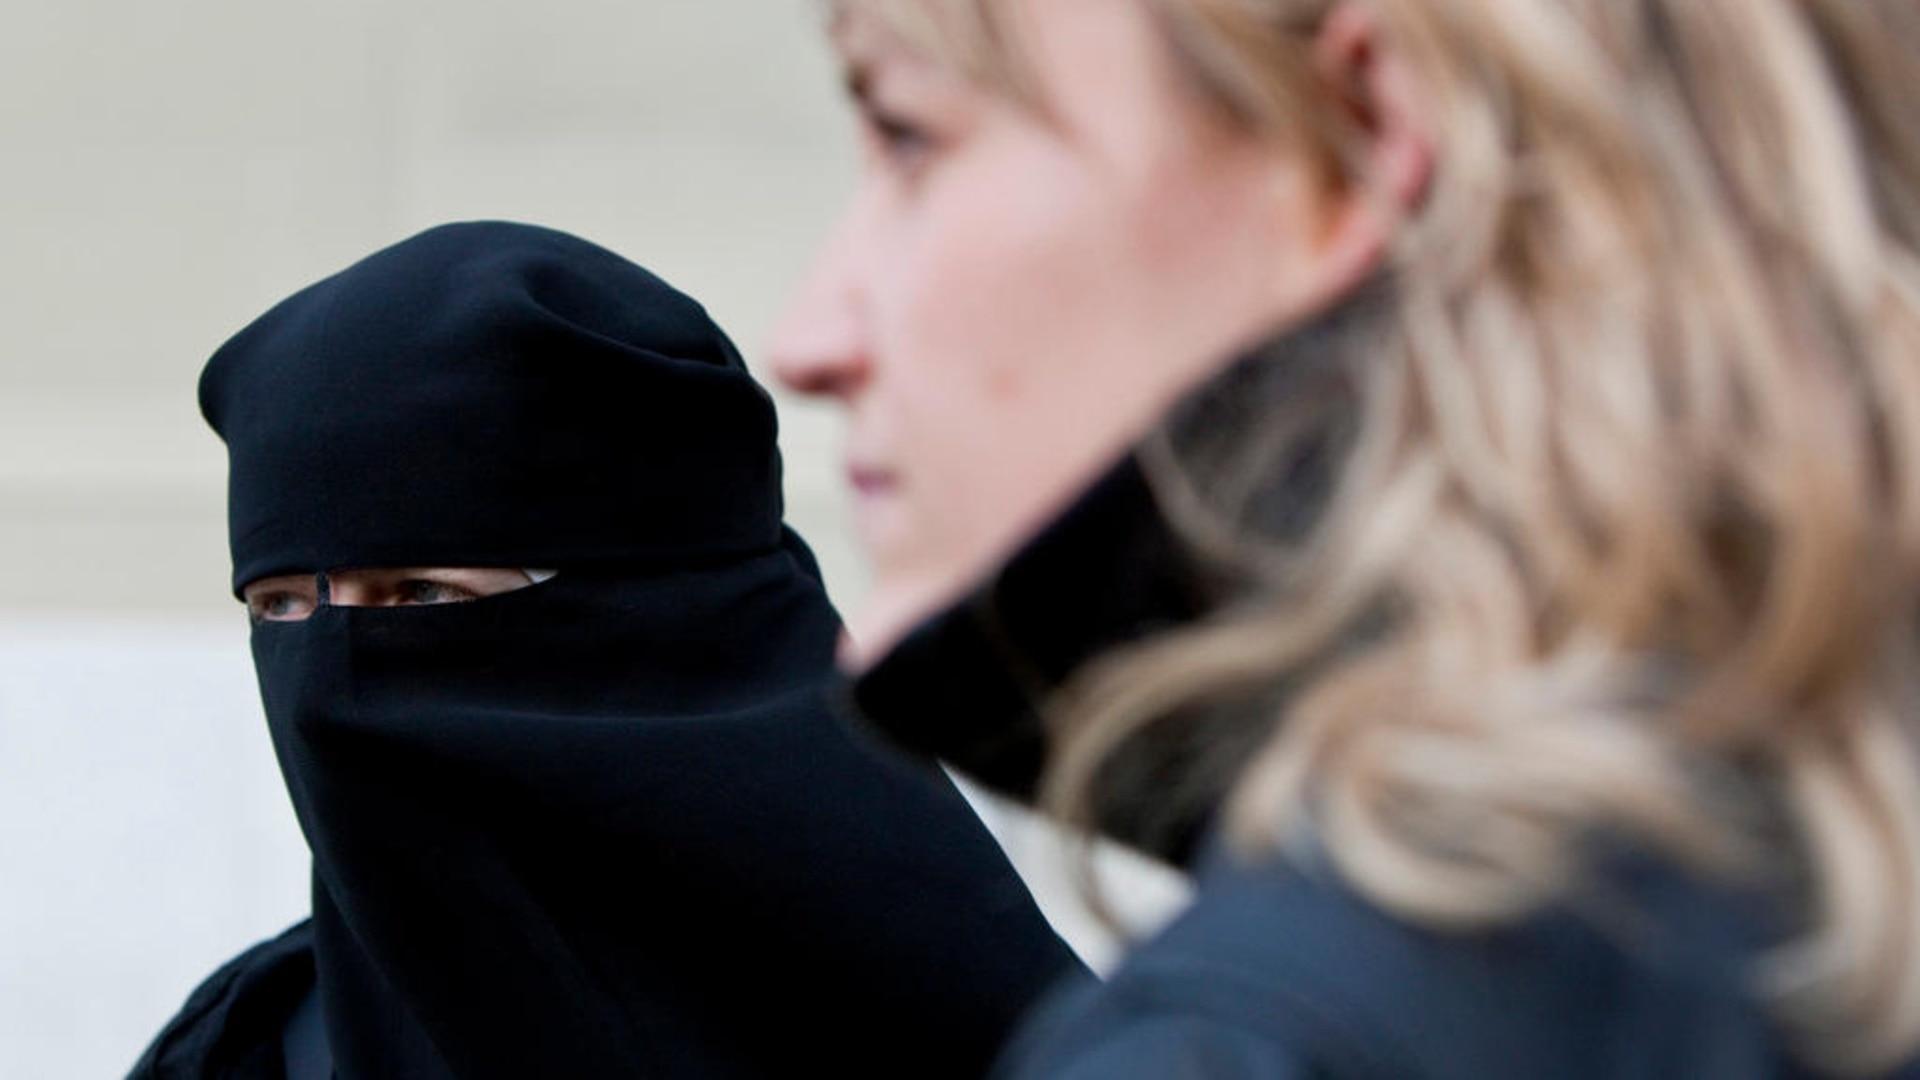 Omul convertit la Islam in cautarea femeii